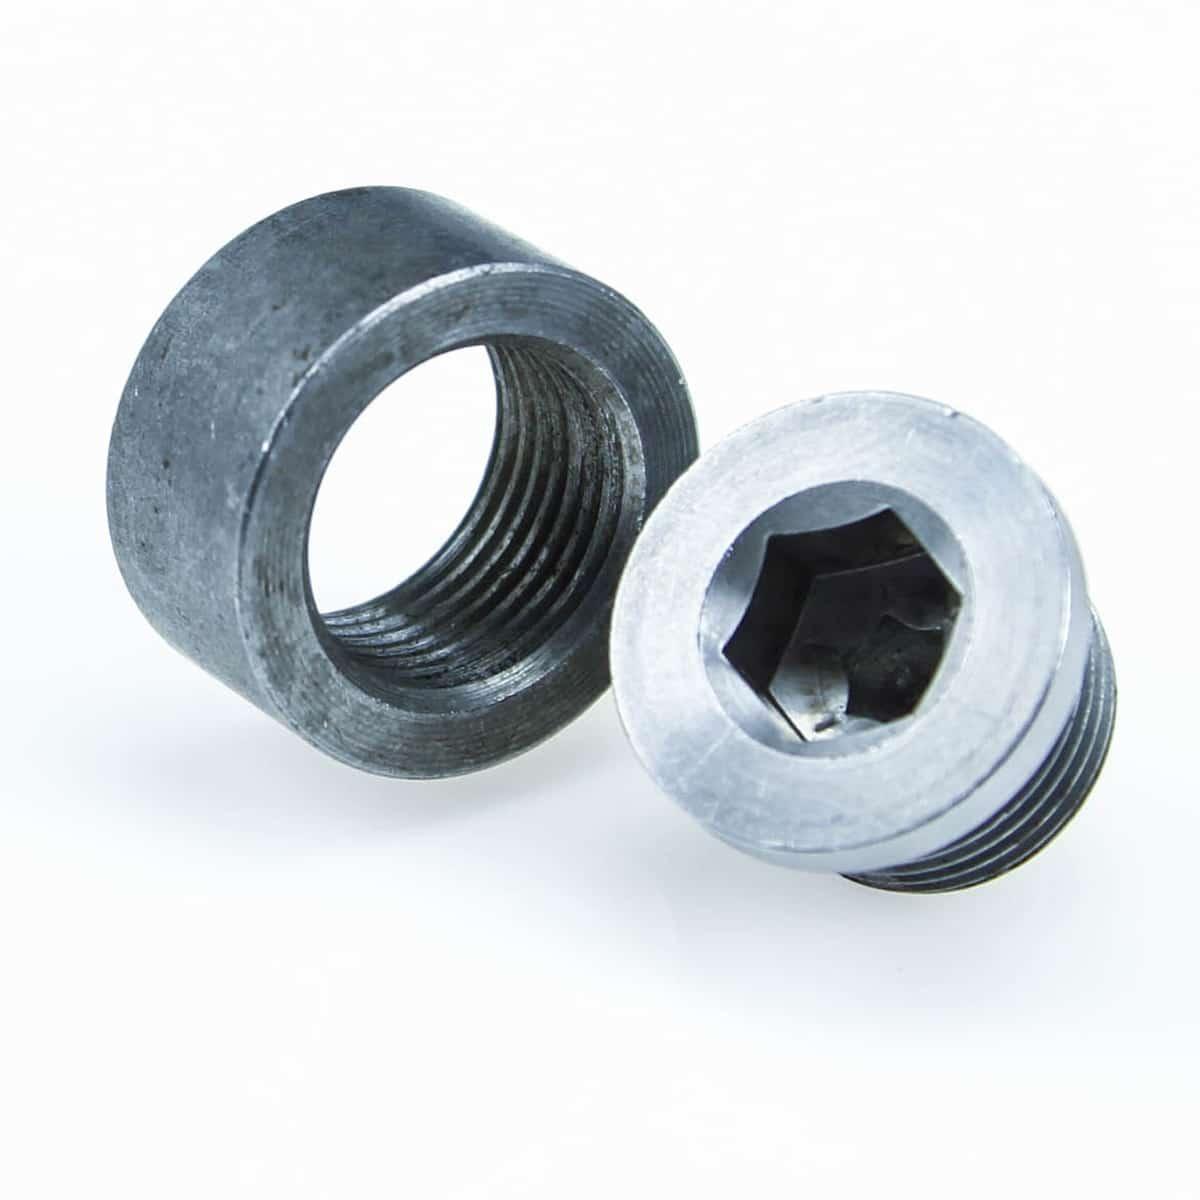 Mild Steel M18X1.5 Thread Bung and Plug Kit - 3735